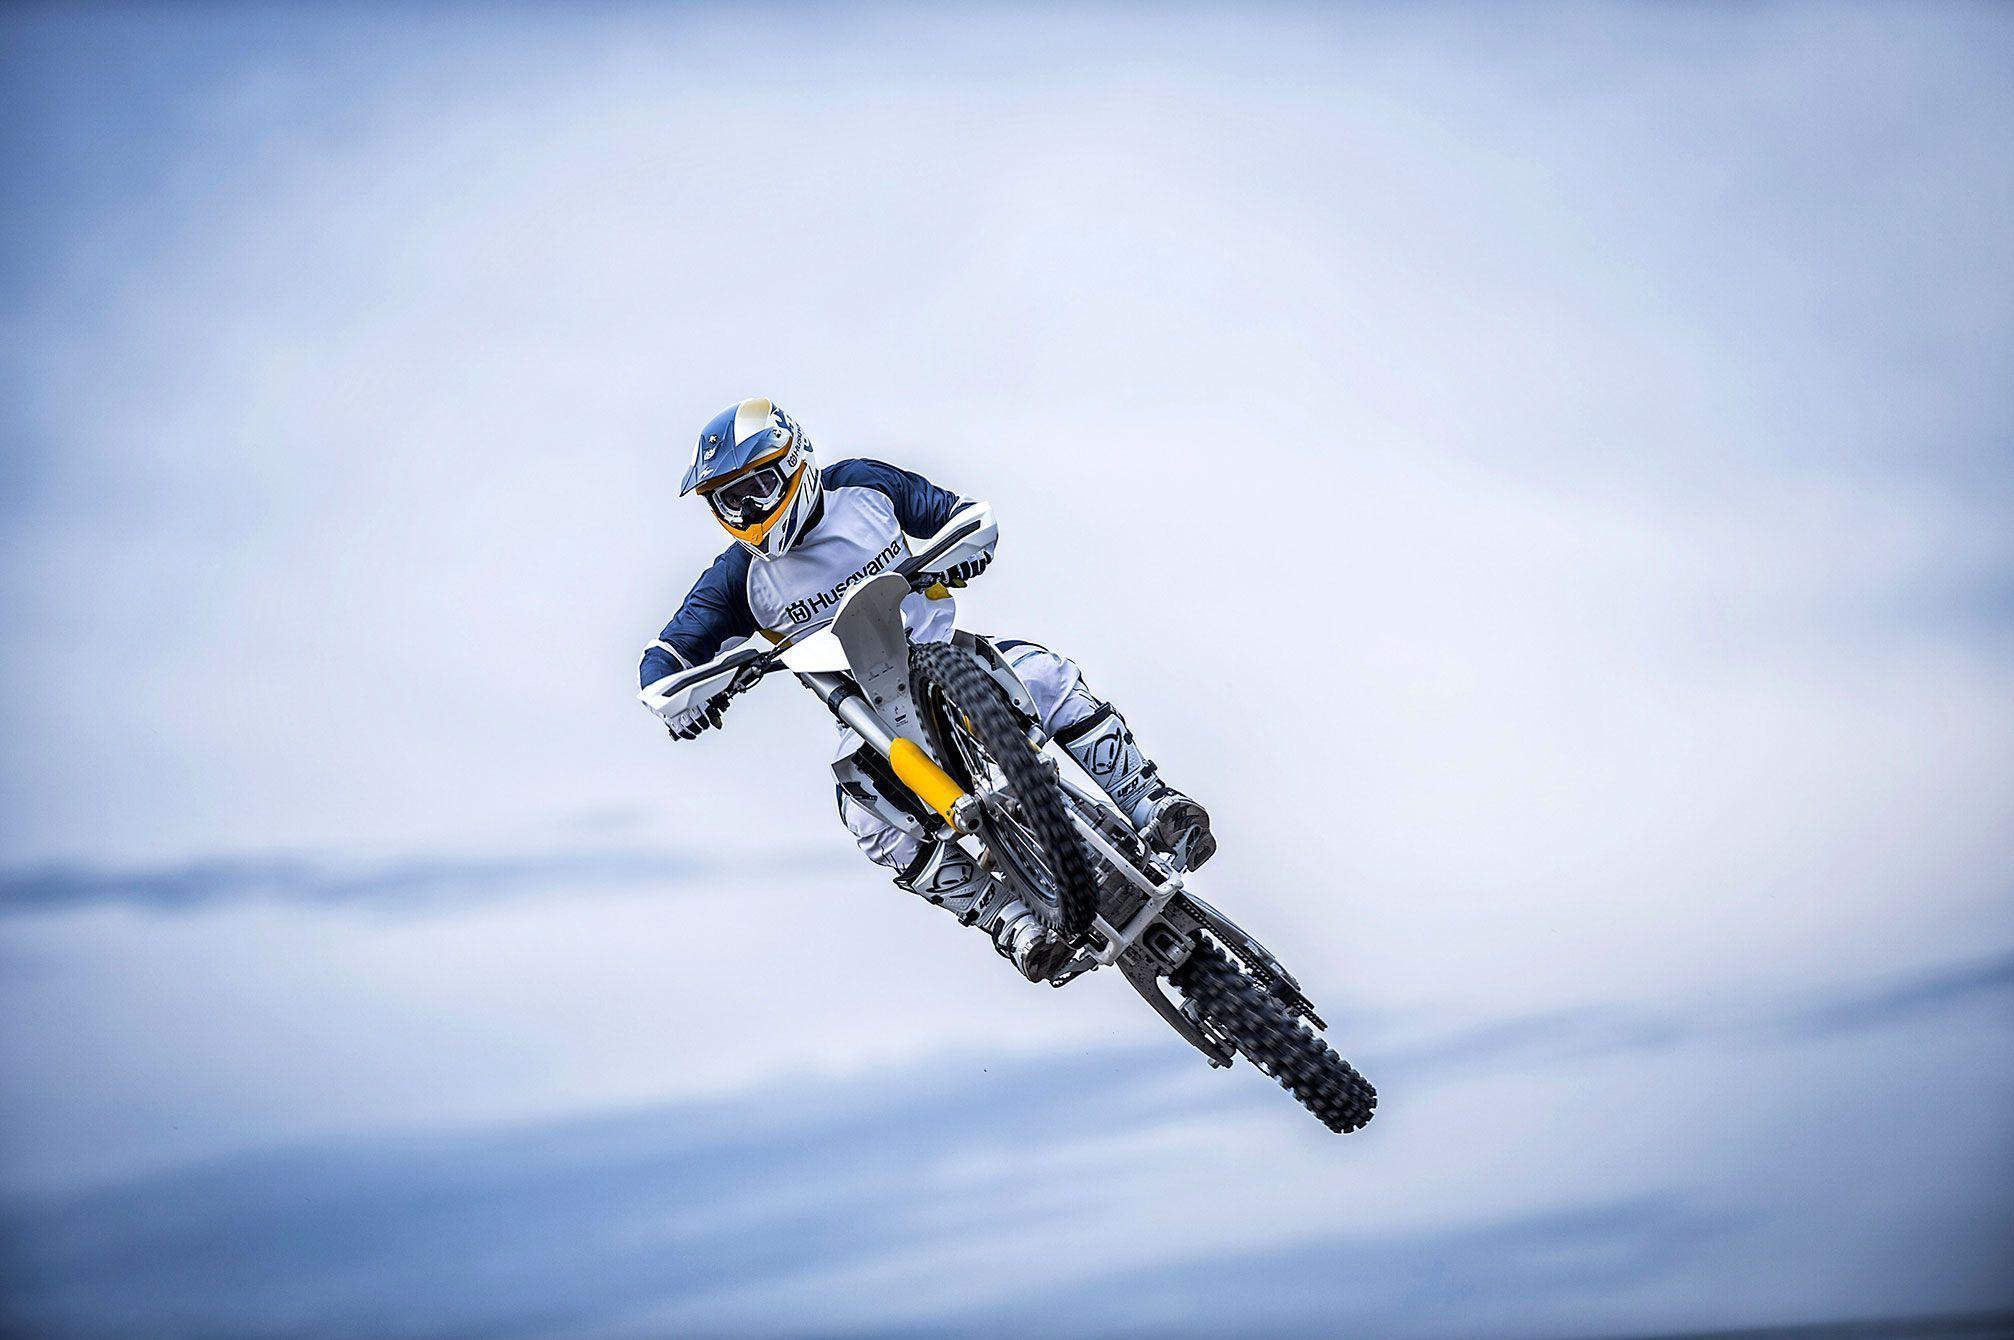 Motocross 2015 Wallpapers